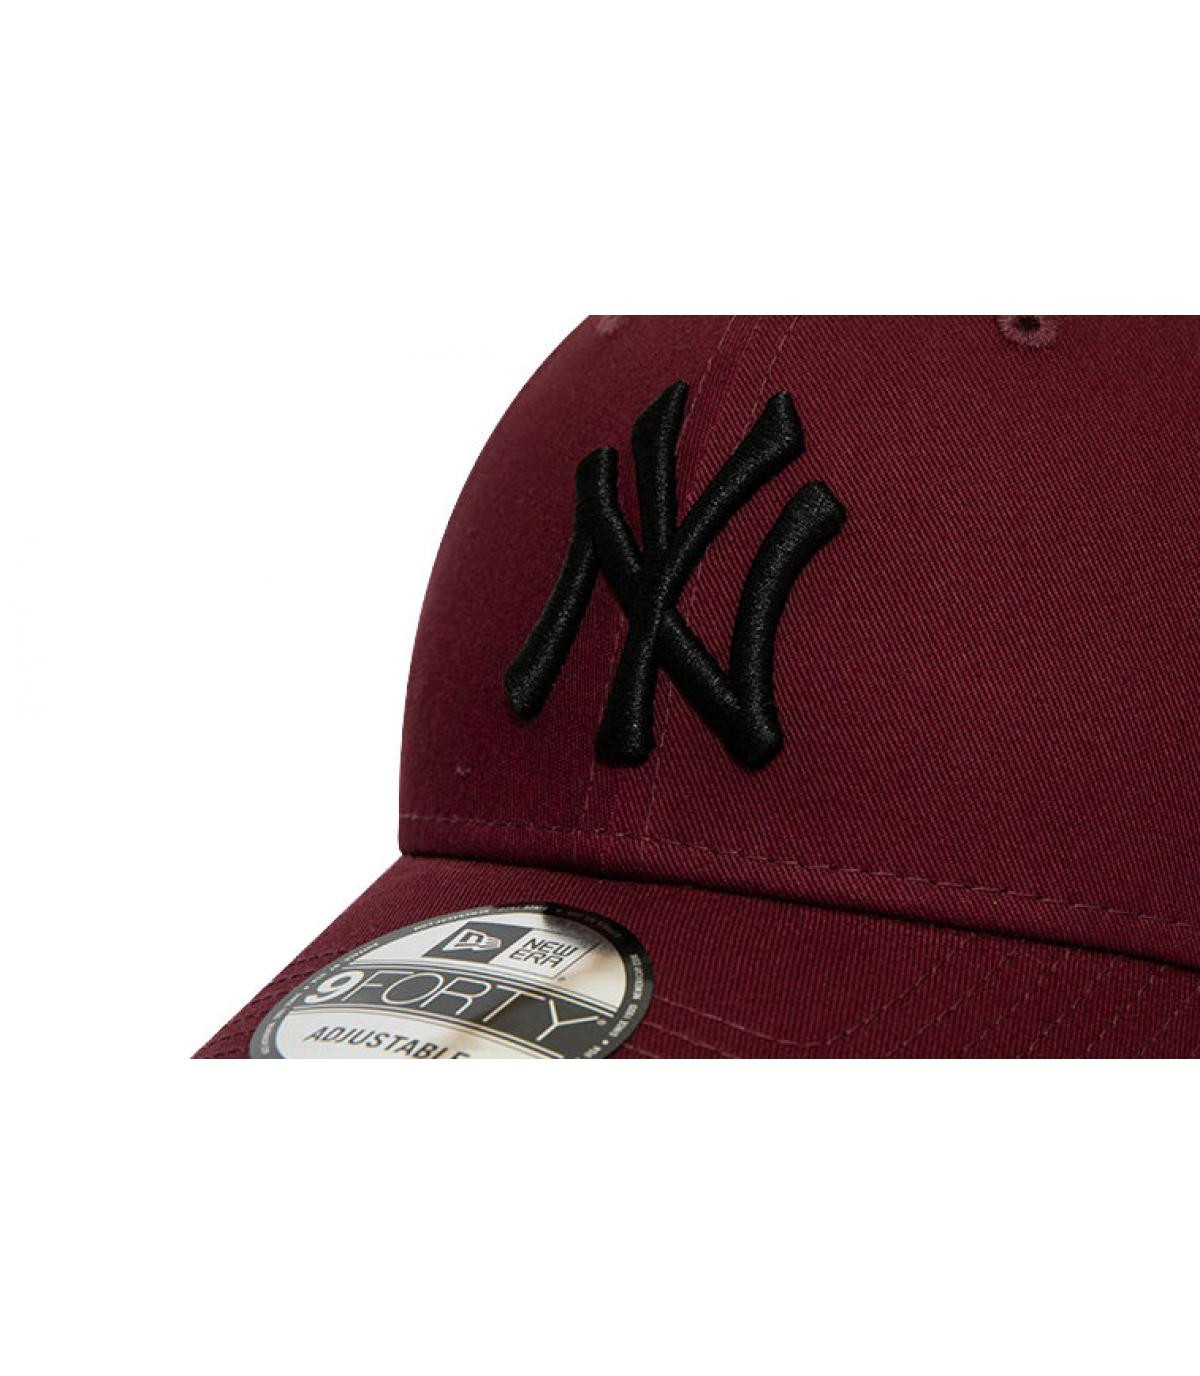 Details Kids League Ess NY 940 maroon black - afbeeling 3